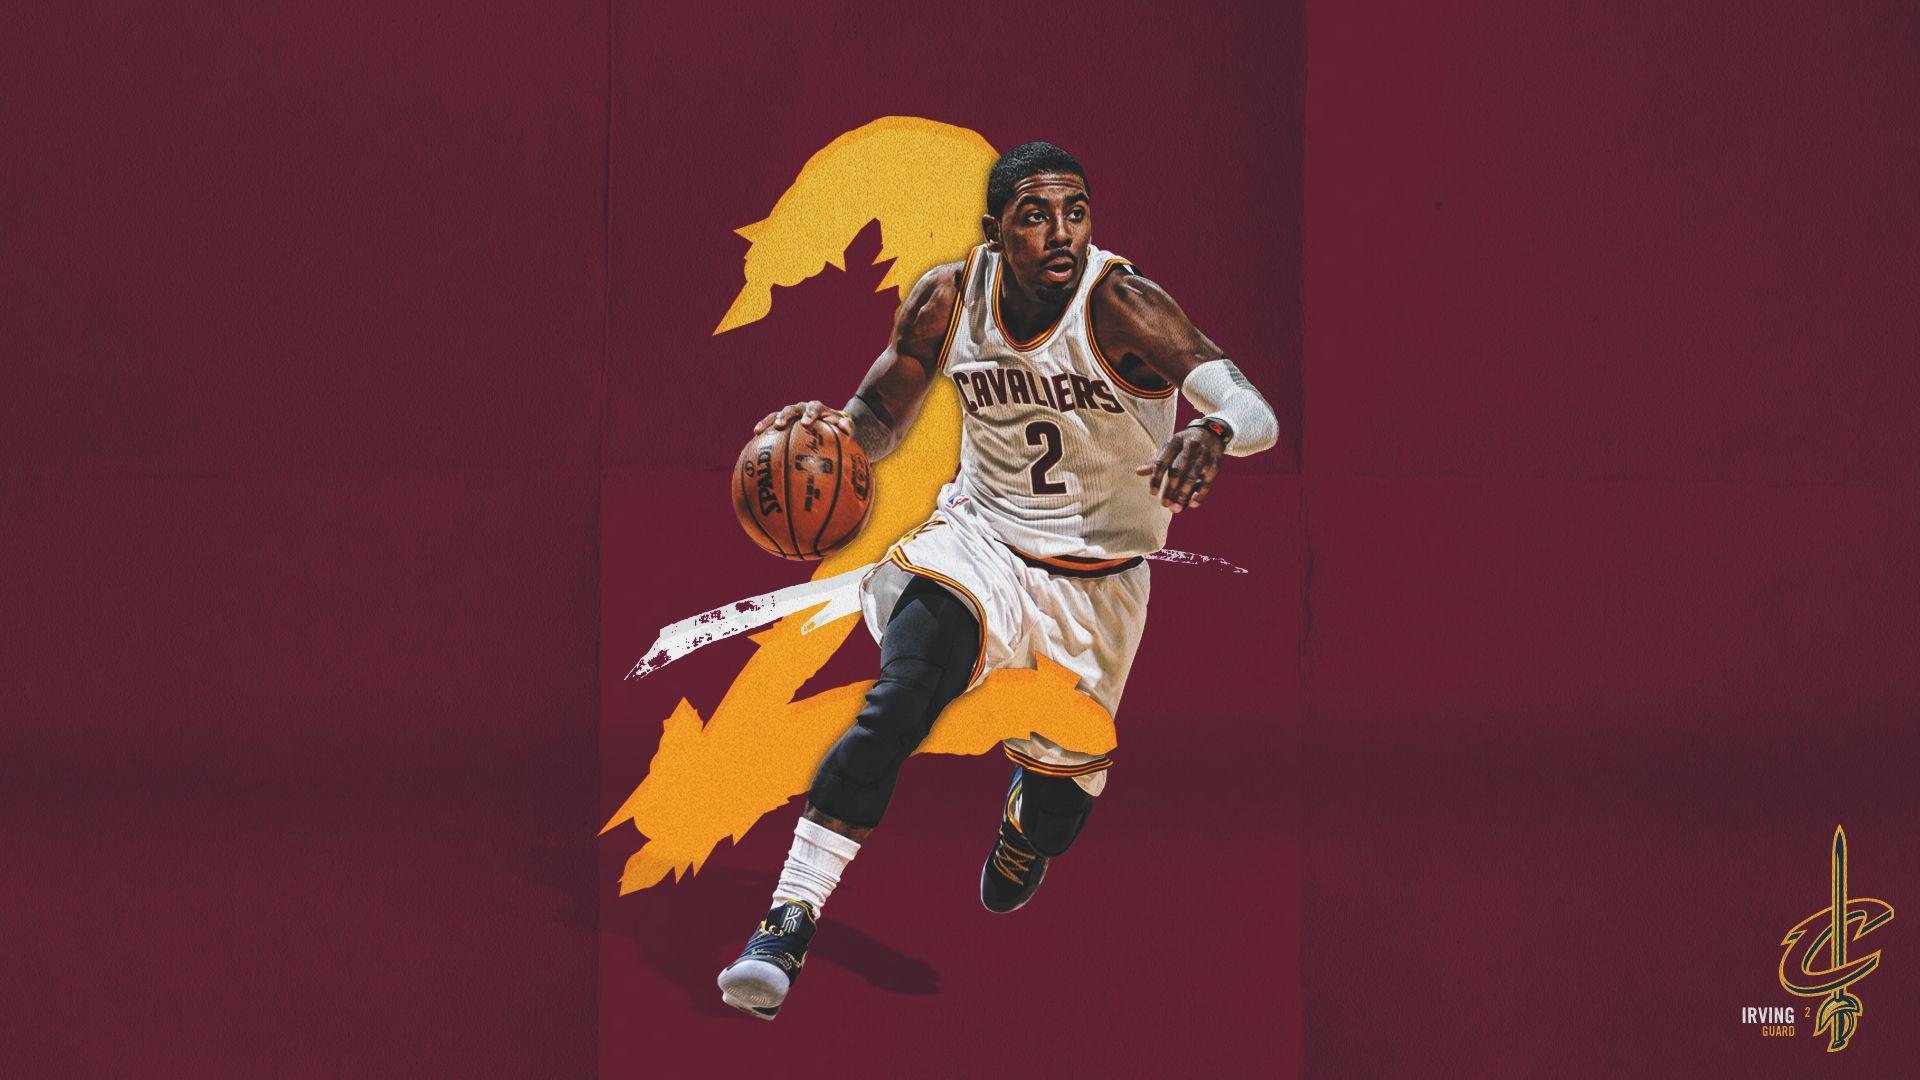 Cleveland Cavaliersdefending champion Cleveland